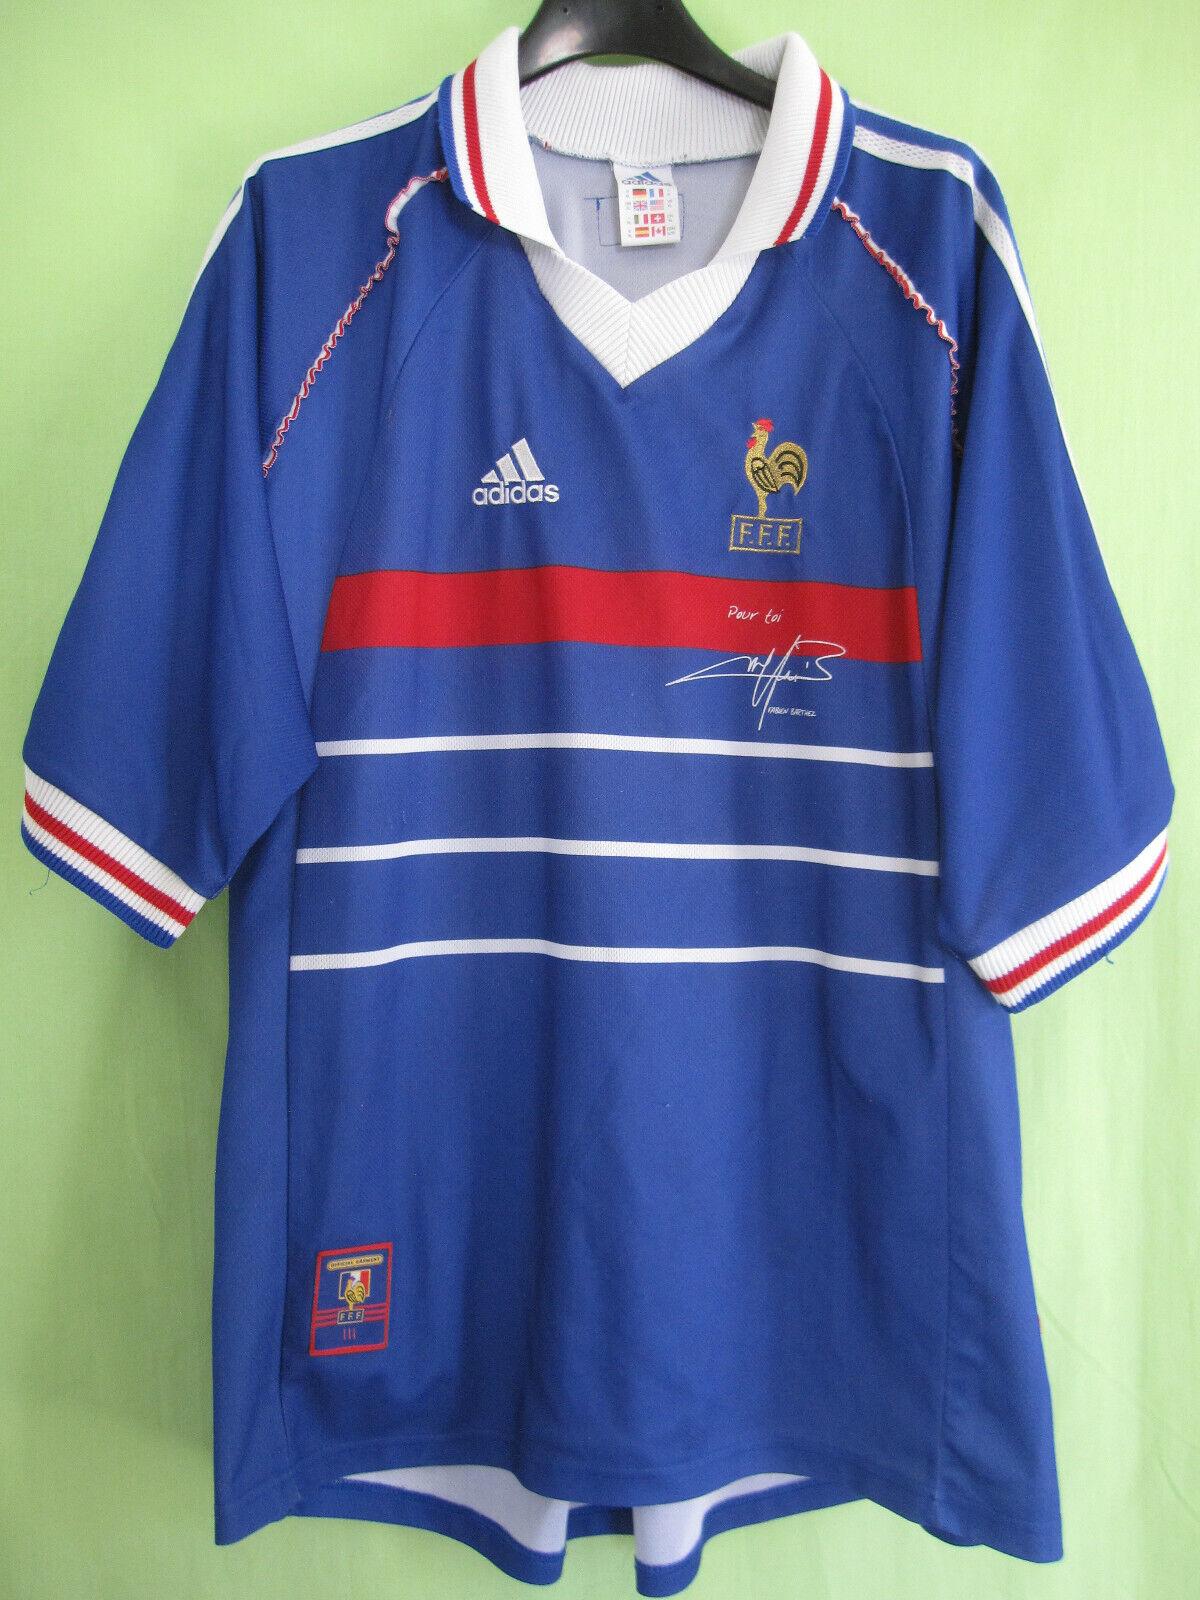 Maillot EQUIPE DE FRANCE Mondial 1998 Vintage Adidas Pour toi Barthez - XL